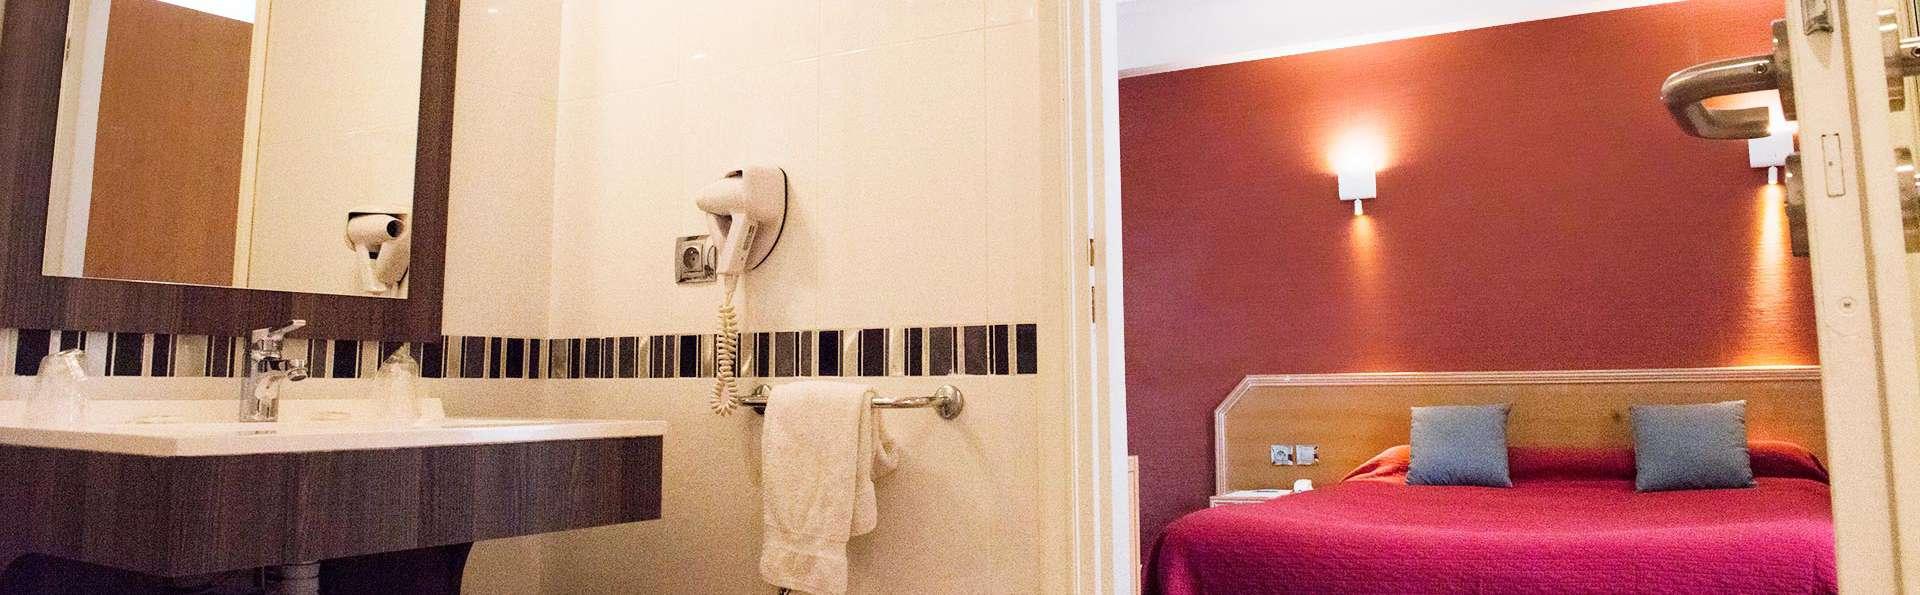 Hôtel Restaurant Le Tivoli - EDIT_bath.jpg